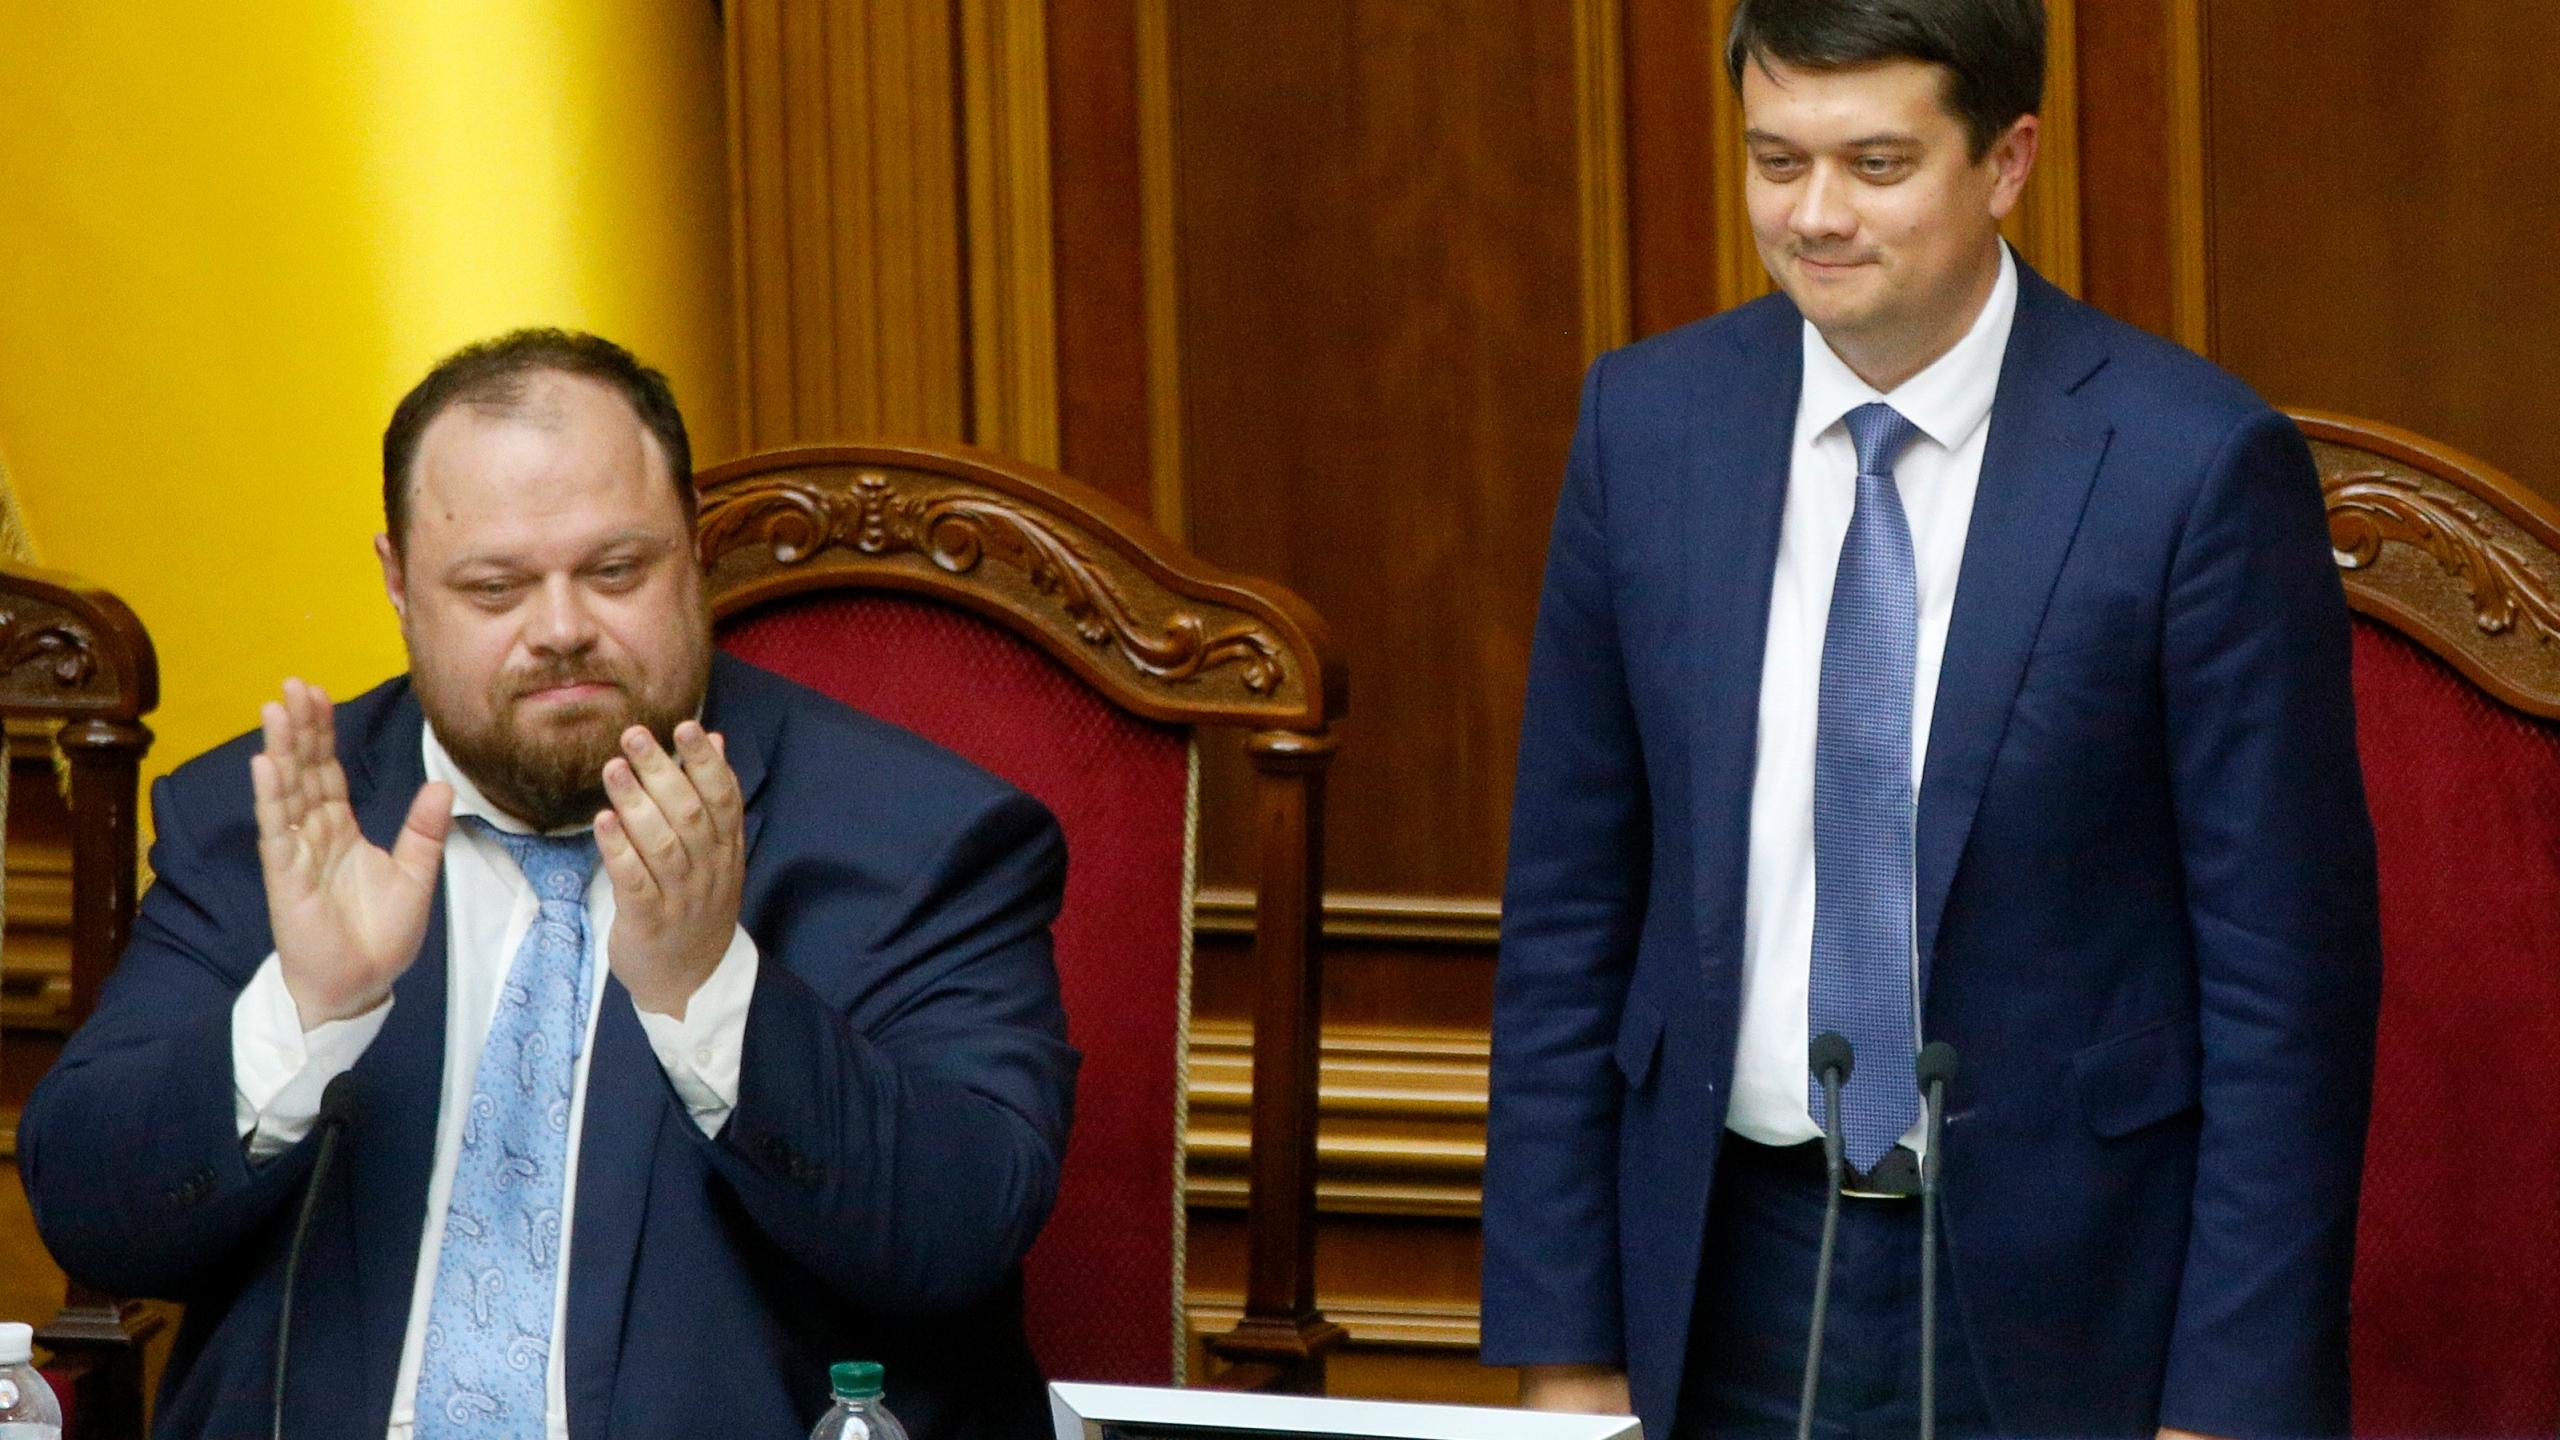 Dmytro Razumkov, Russian Stefanchuk